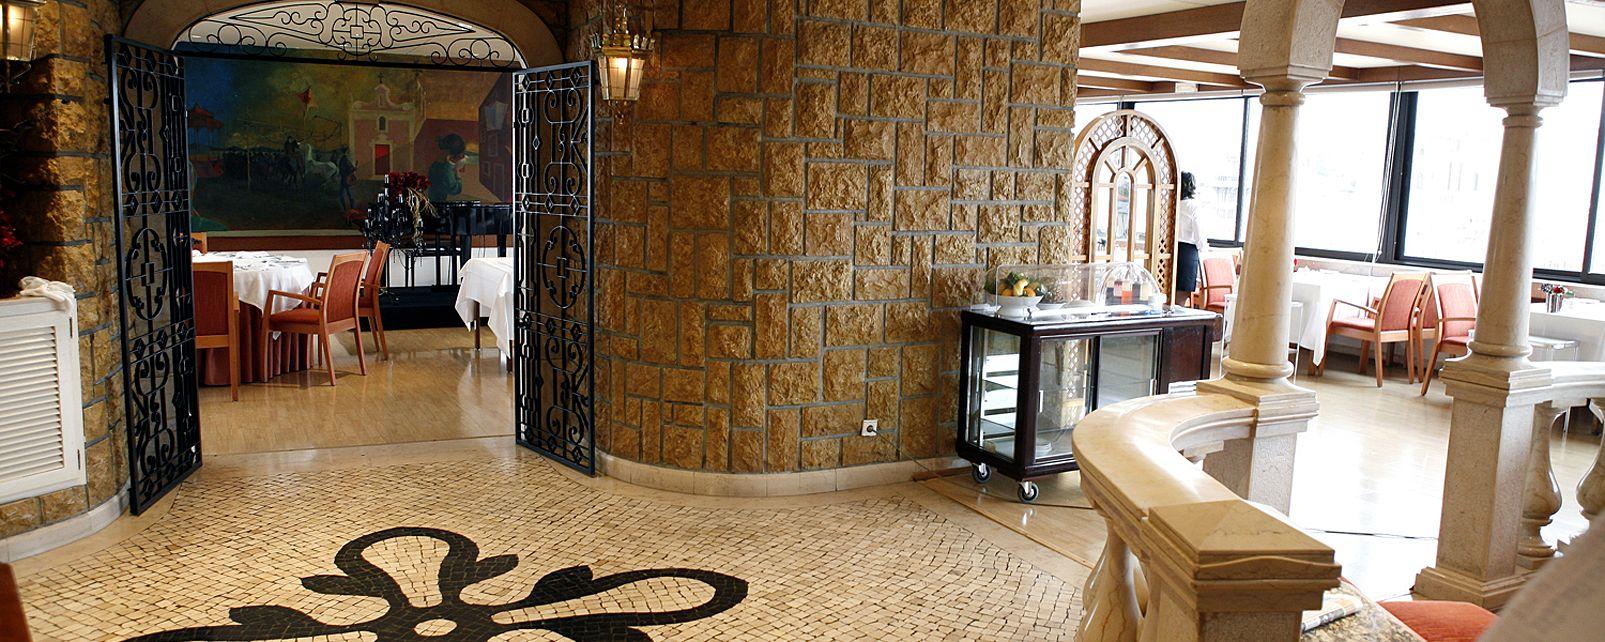 Hôtel Mundial